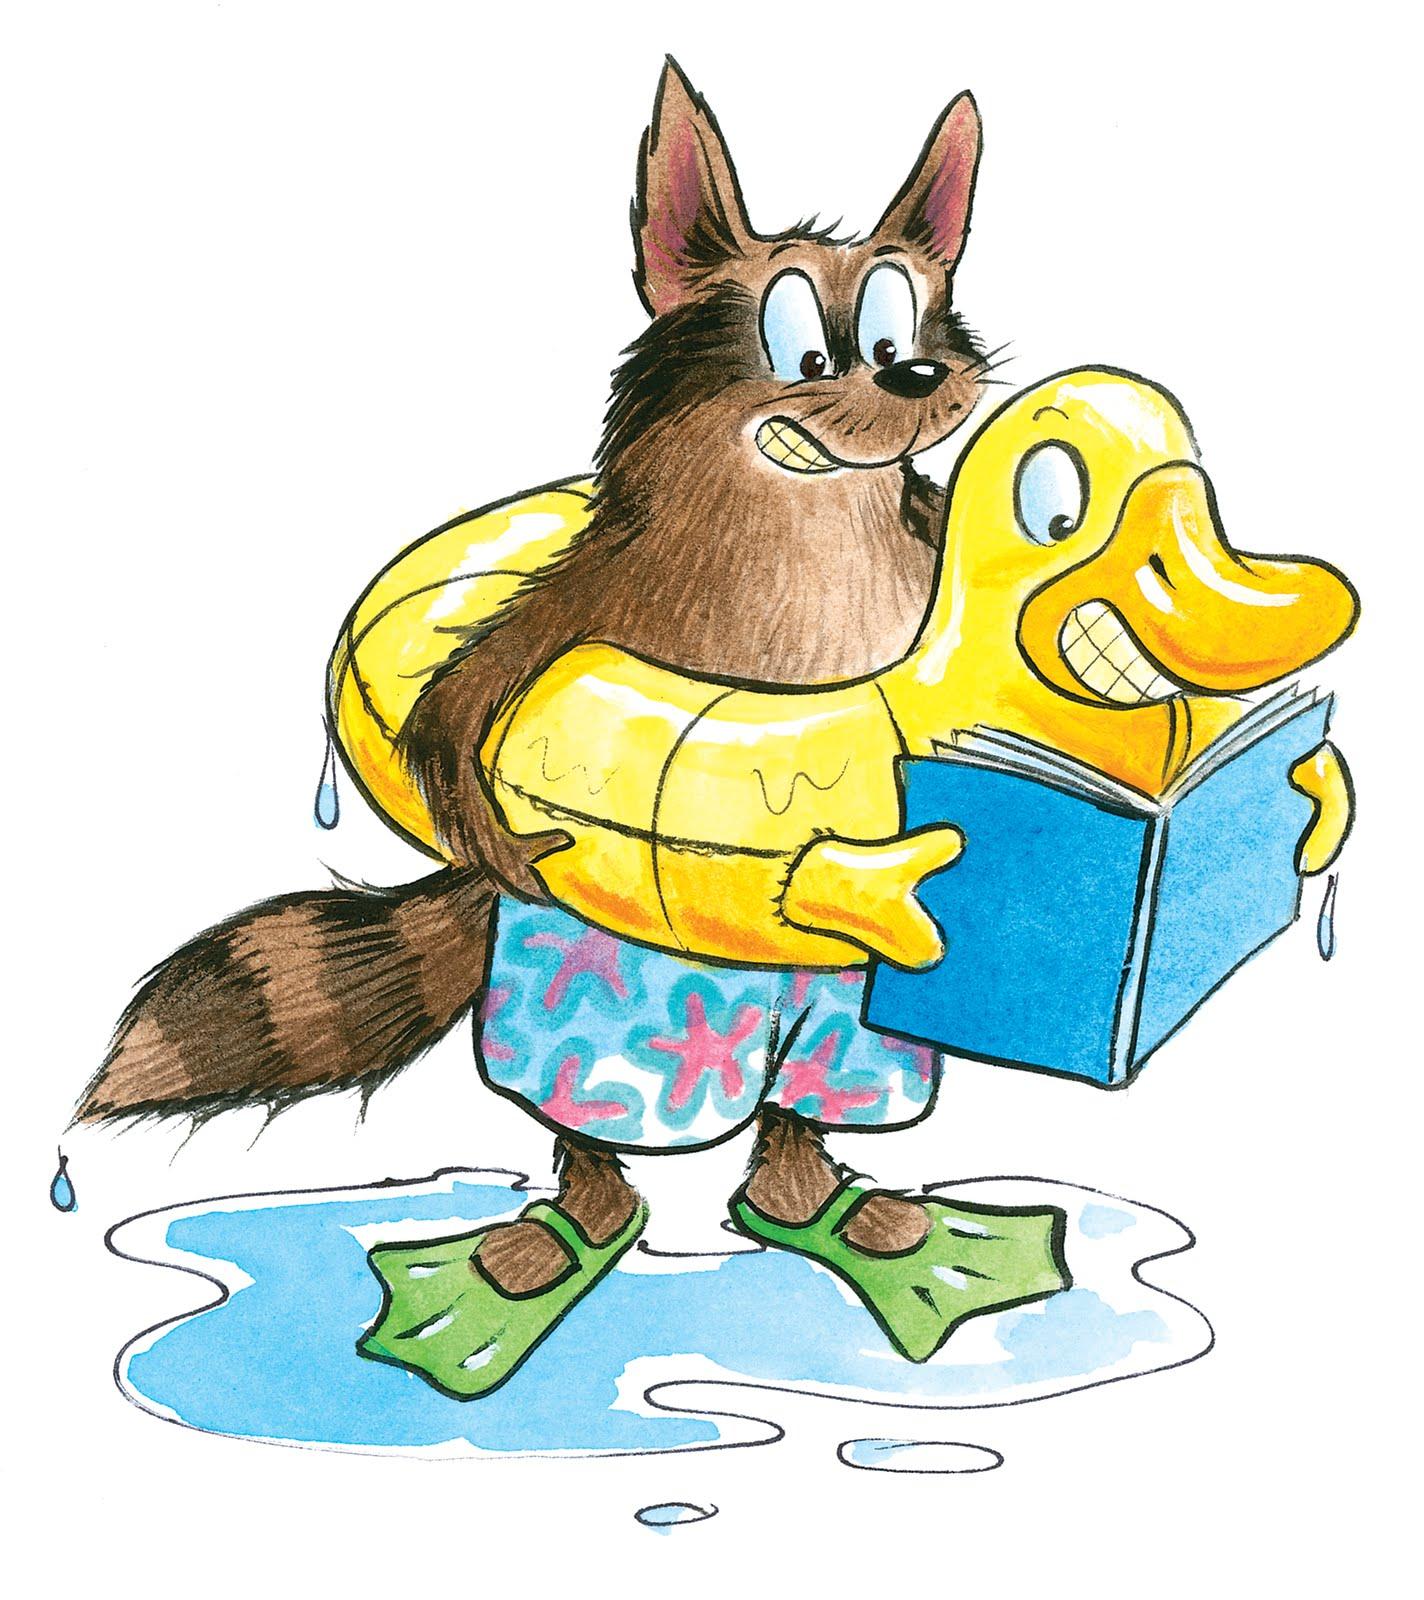 the children s room blog make a splash read summer reading club rh syossetkids blogspot com summer reading clipart 2018 summer reading clipart free